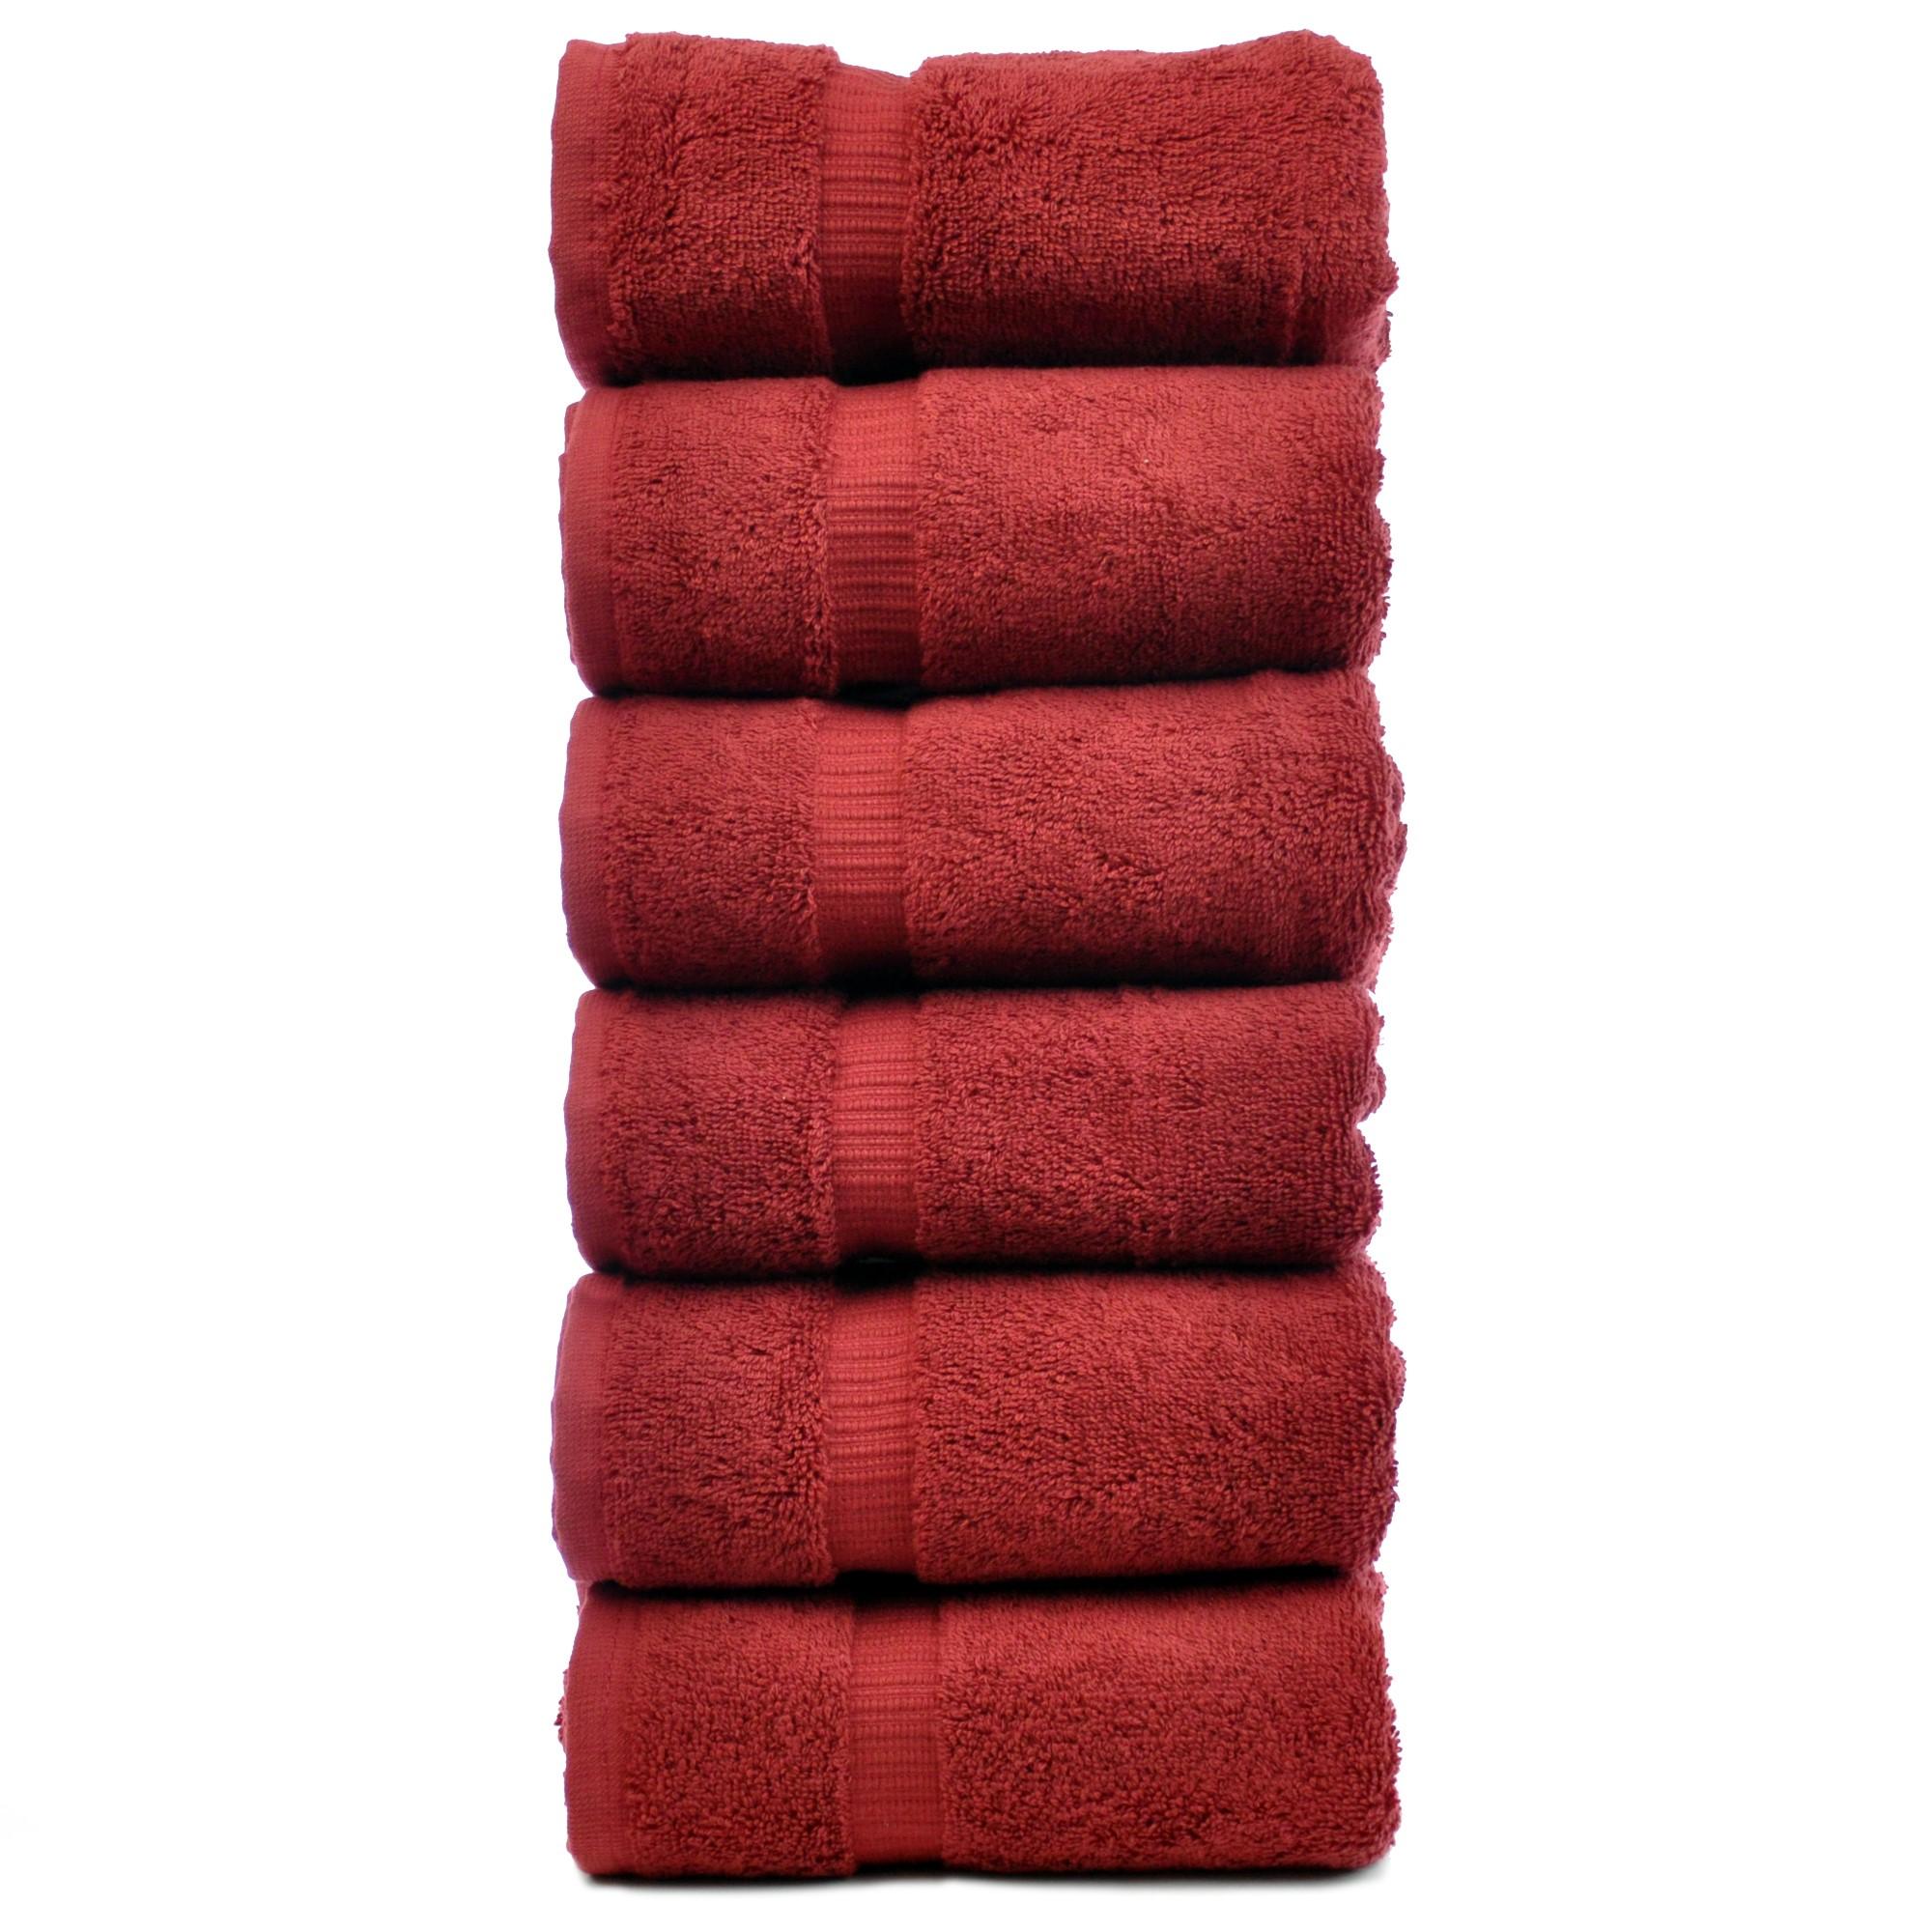 Chakir Linen Dobby Border Turkish Cotton Hand Towel Set